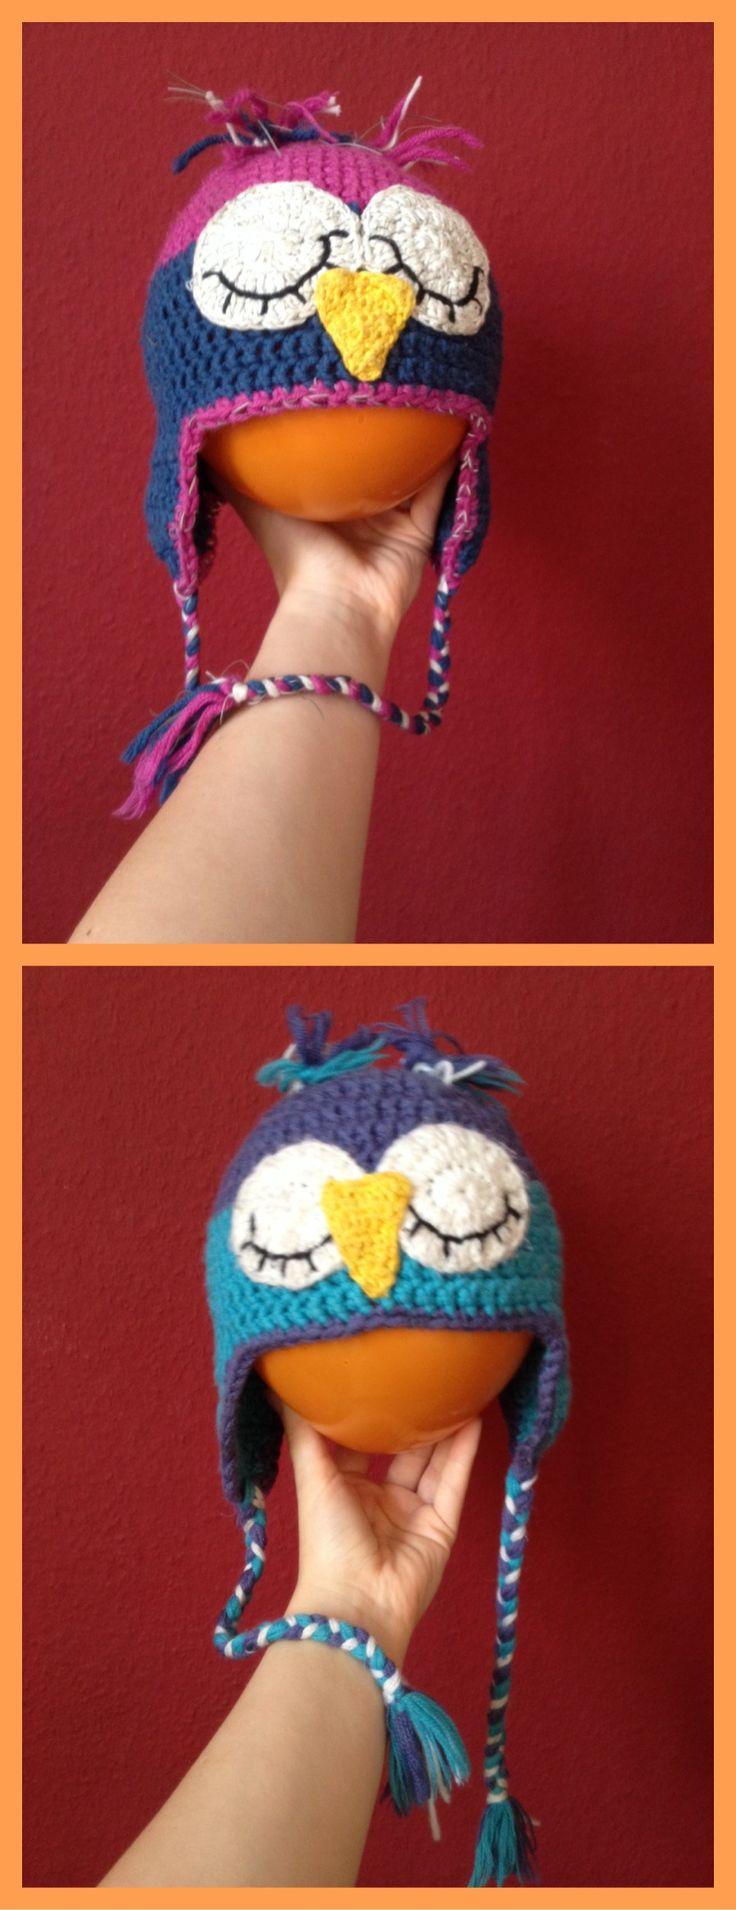 Wintertime, owl time. Added reflecting yarn. Savety first!  Ebook in link below.